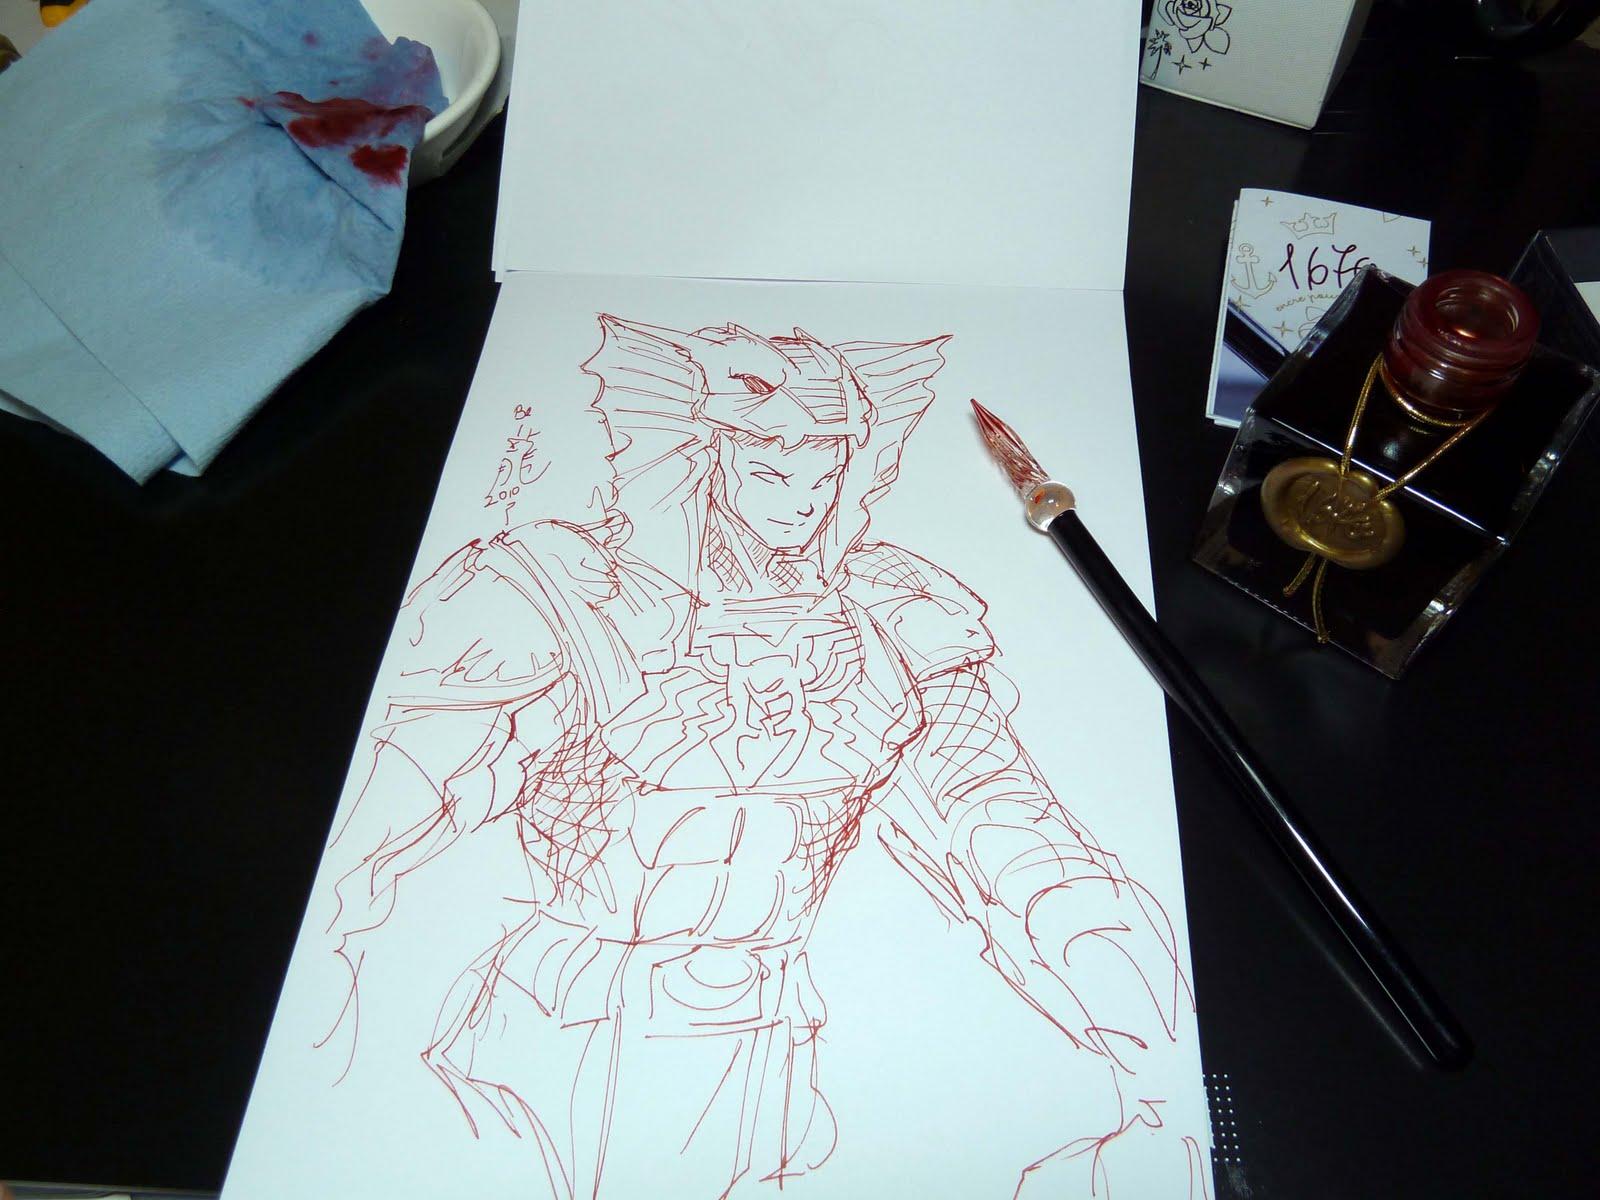 http://3.bp.blogspot.com/_idUARdOEJAk/TDbT3jTM_rI/AAAAAAAAHjM/aOc5s1bwHcA/s1600/J+Herbin+1670+test+doodle+on+Clairefontaine+Triomphe+paper.jpg